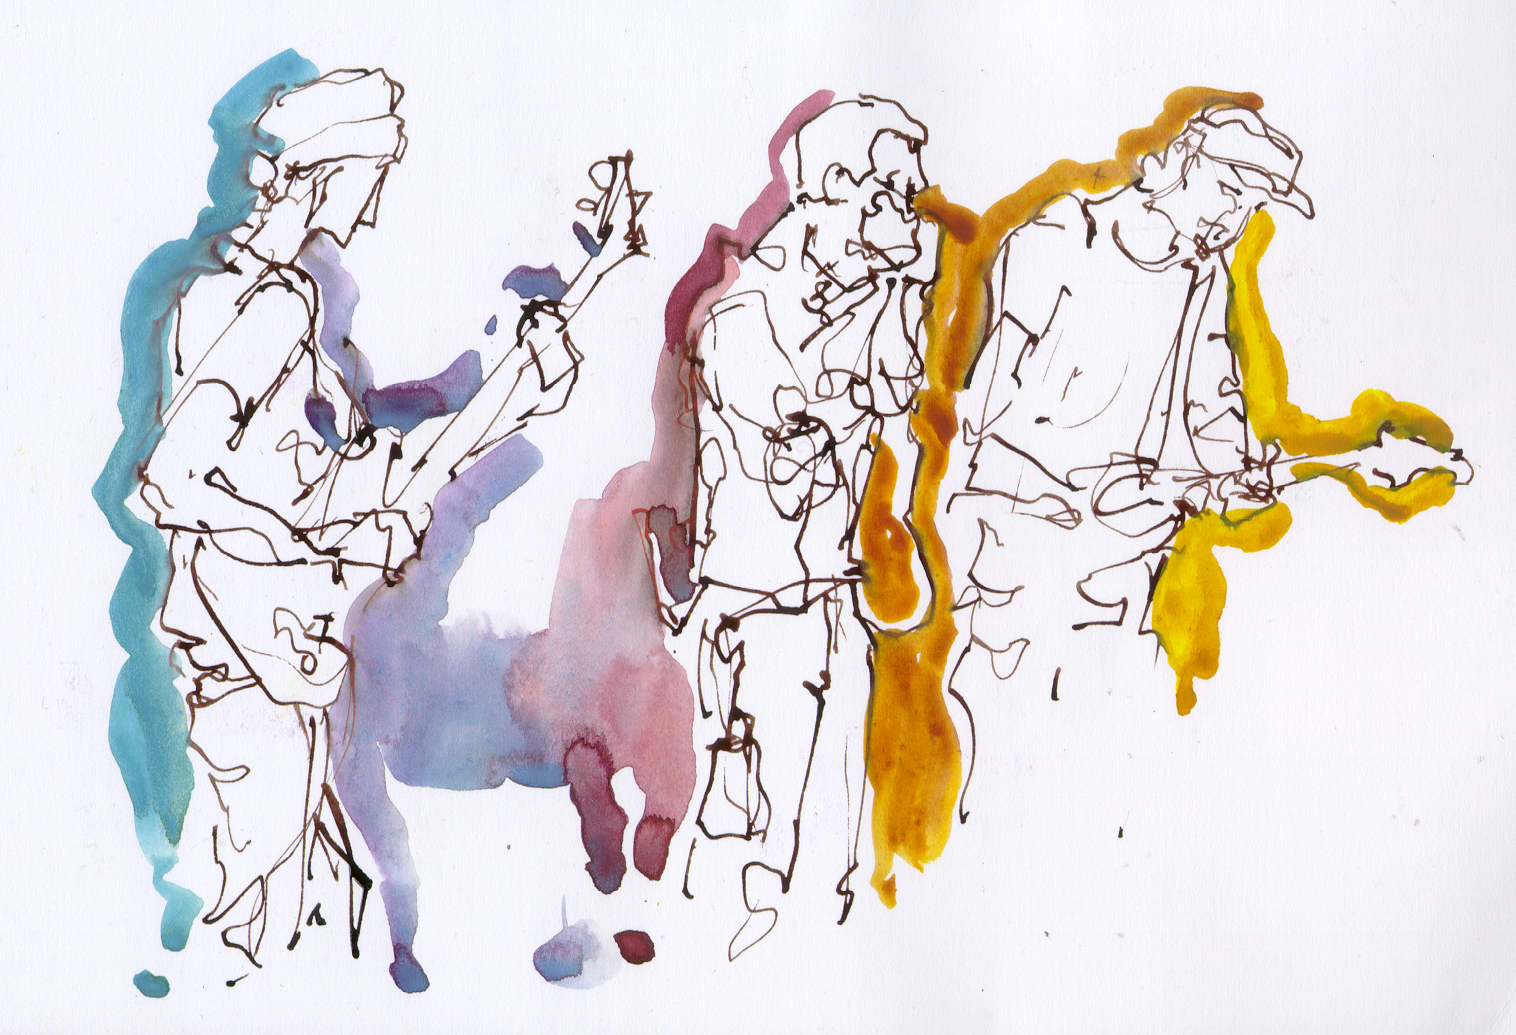 Drawn musician creative The Hands musicians Blues Creative